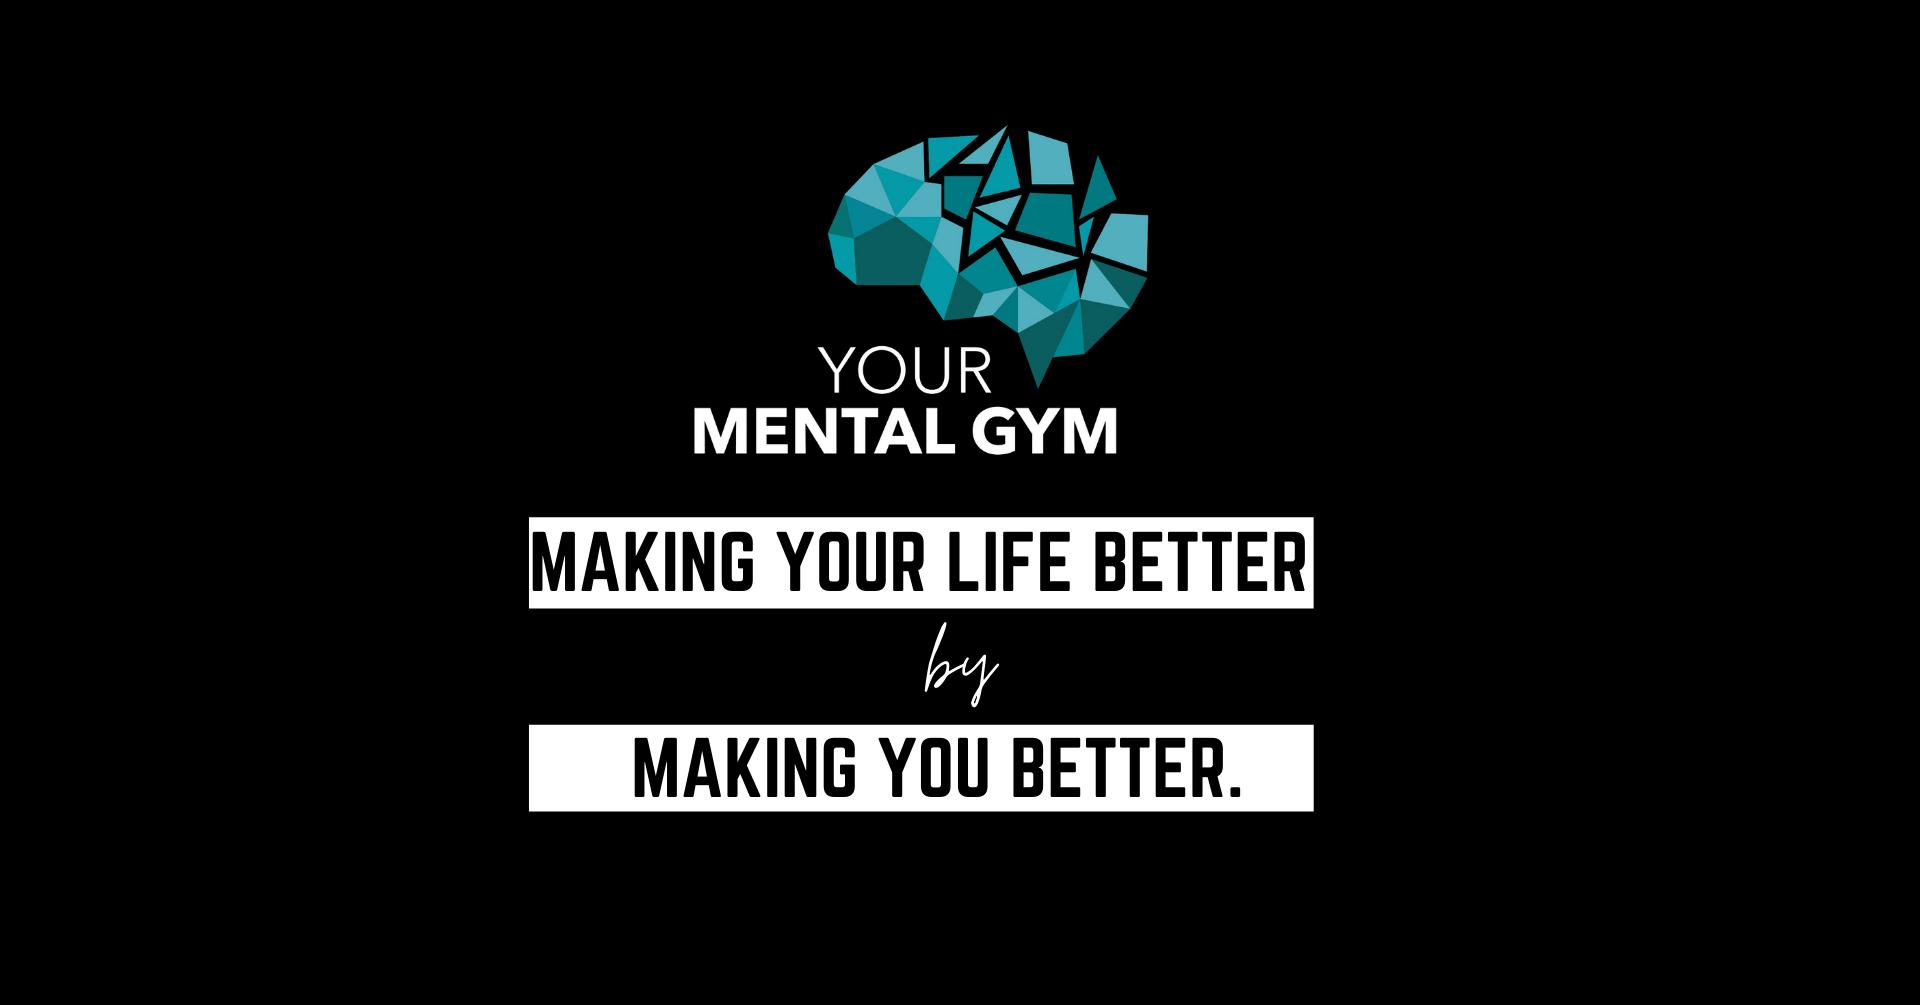 Your Mental Gym: La palestra per la tua mente